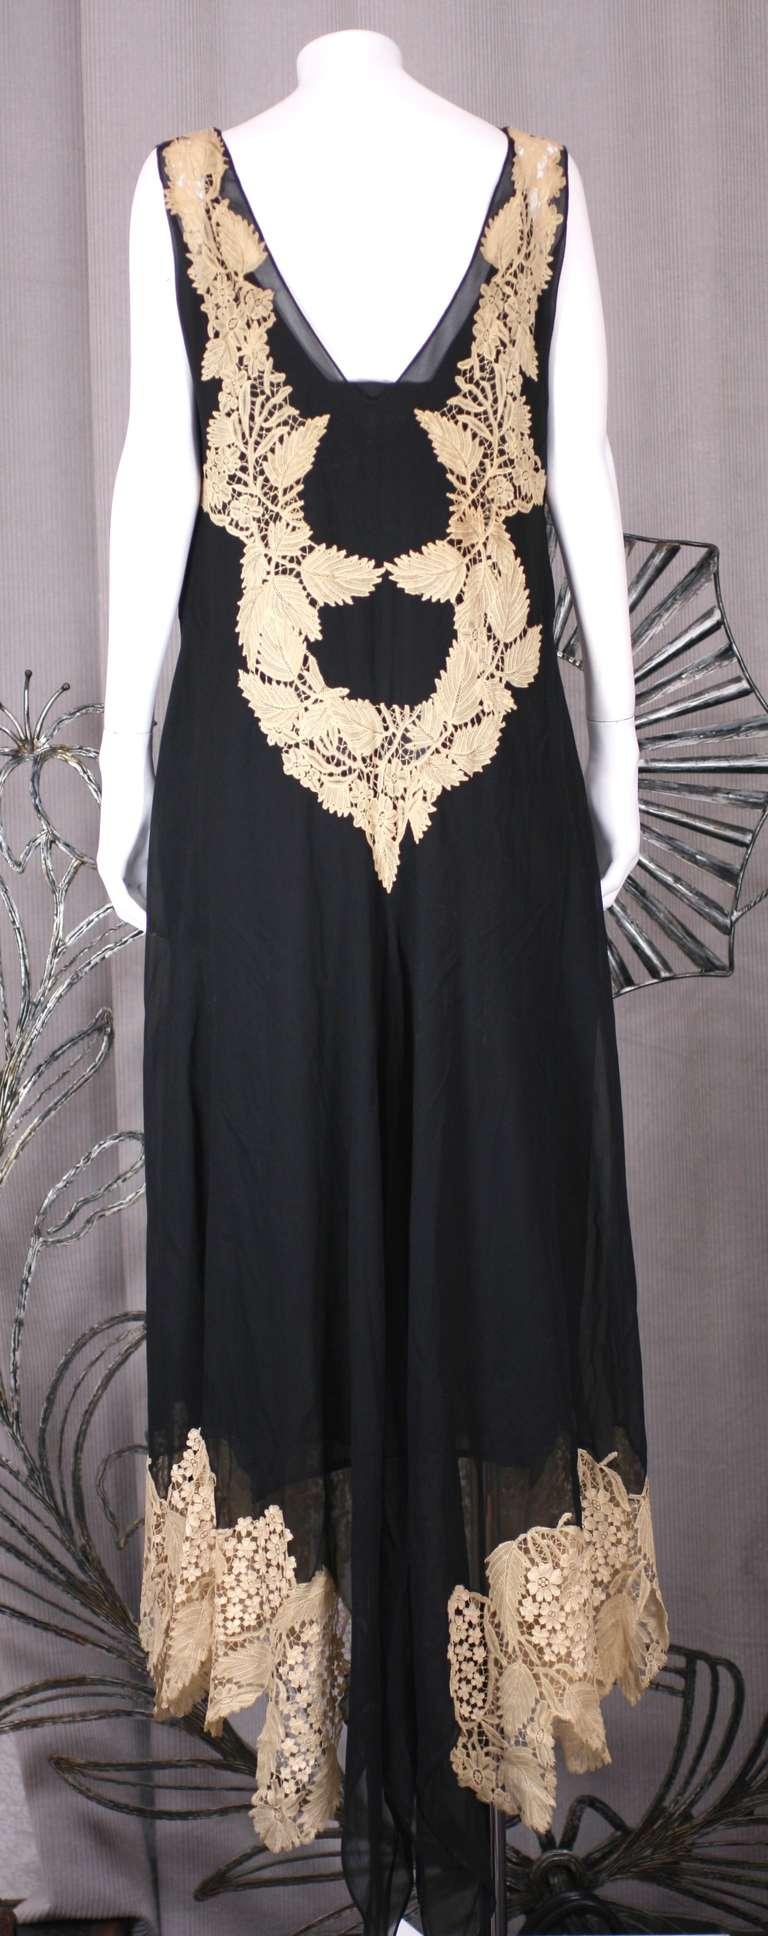 Amazing Art Deco Chiffon Gown with Hydrangea Lace 9